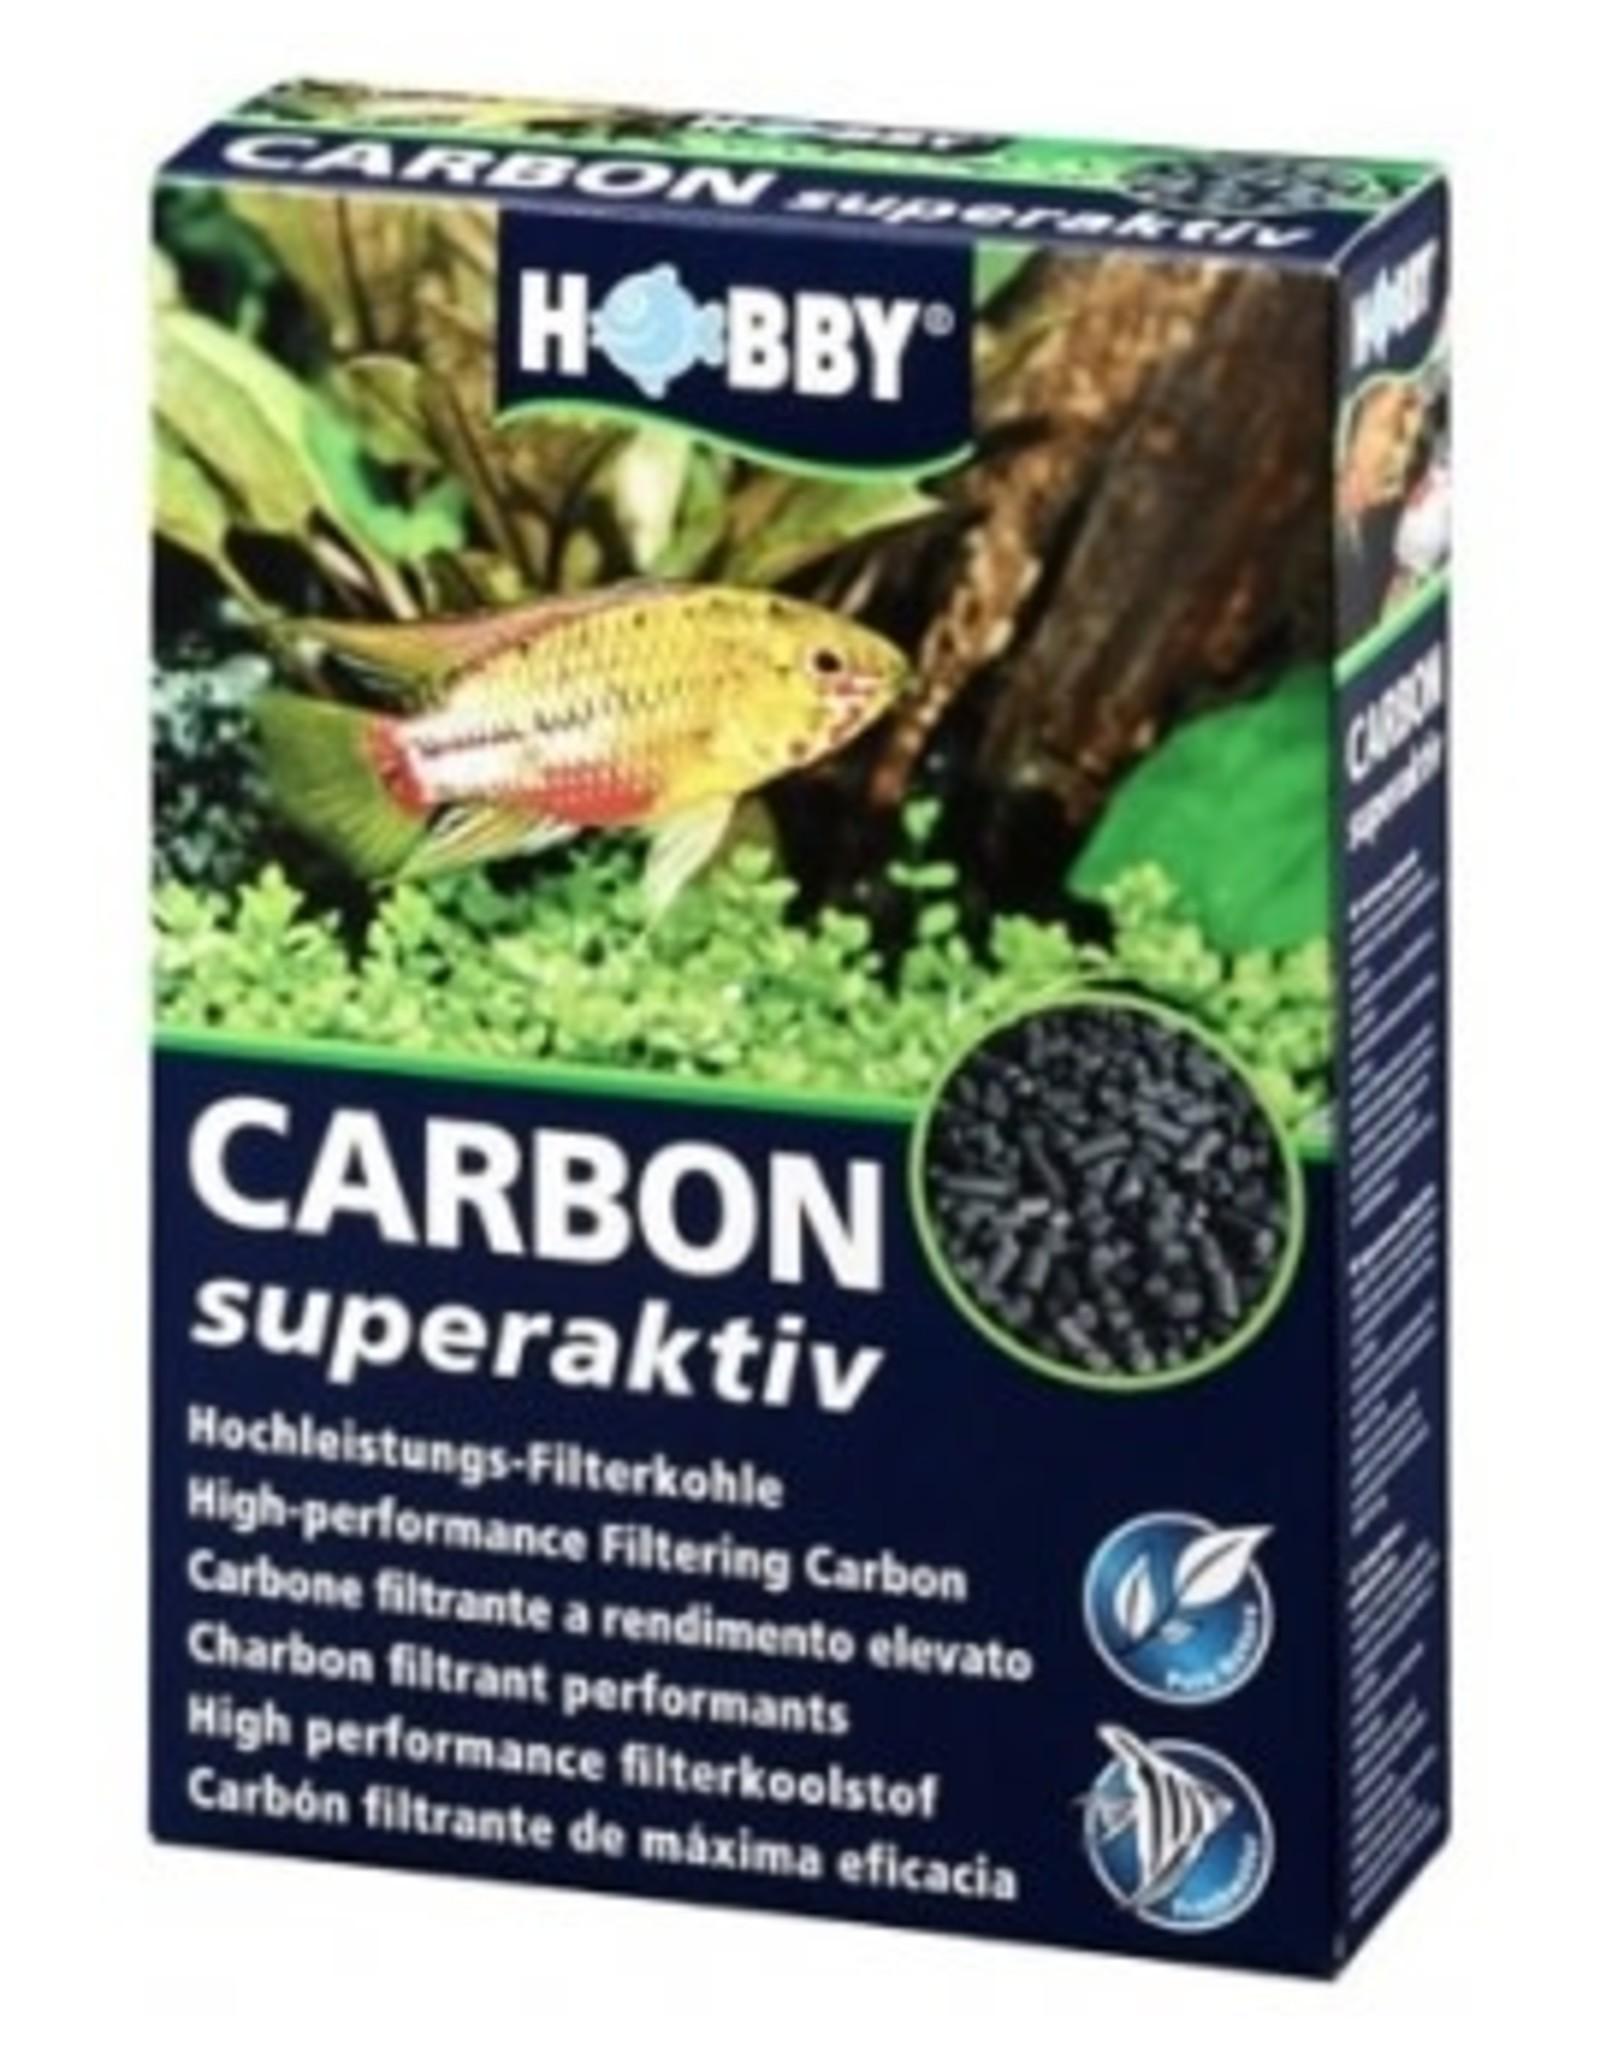 Hobby CHARBON SUPERAKTIV 500grs